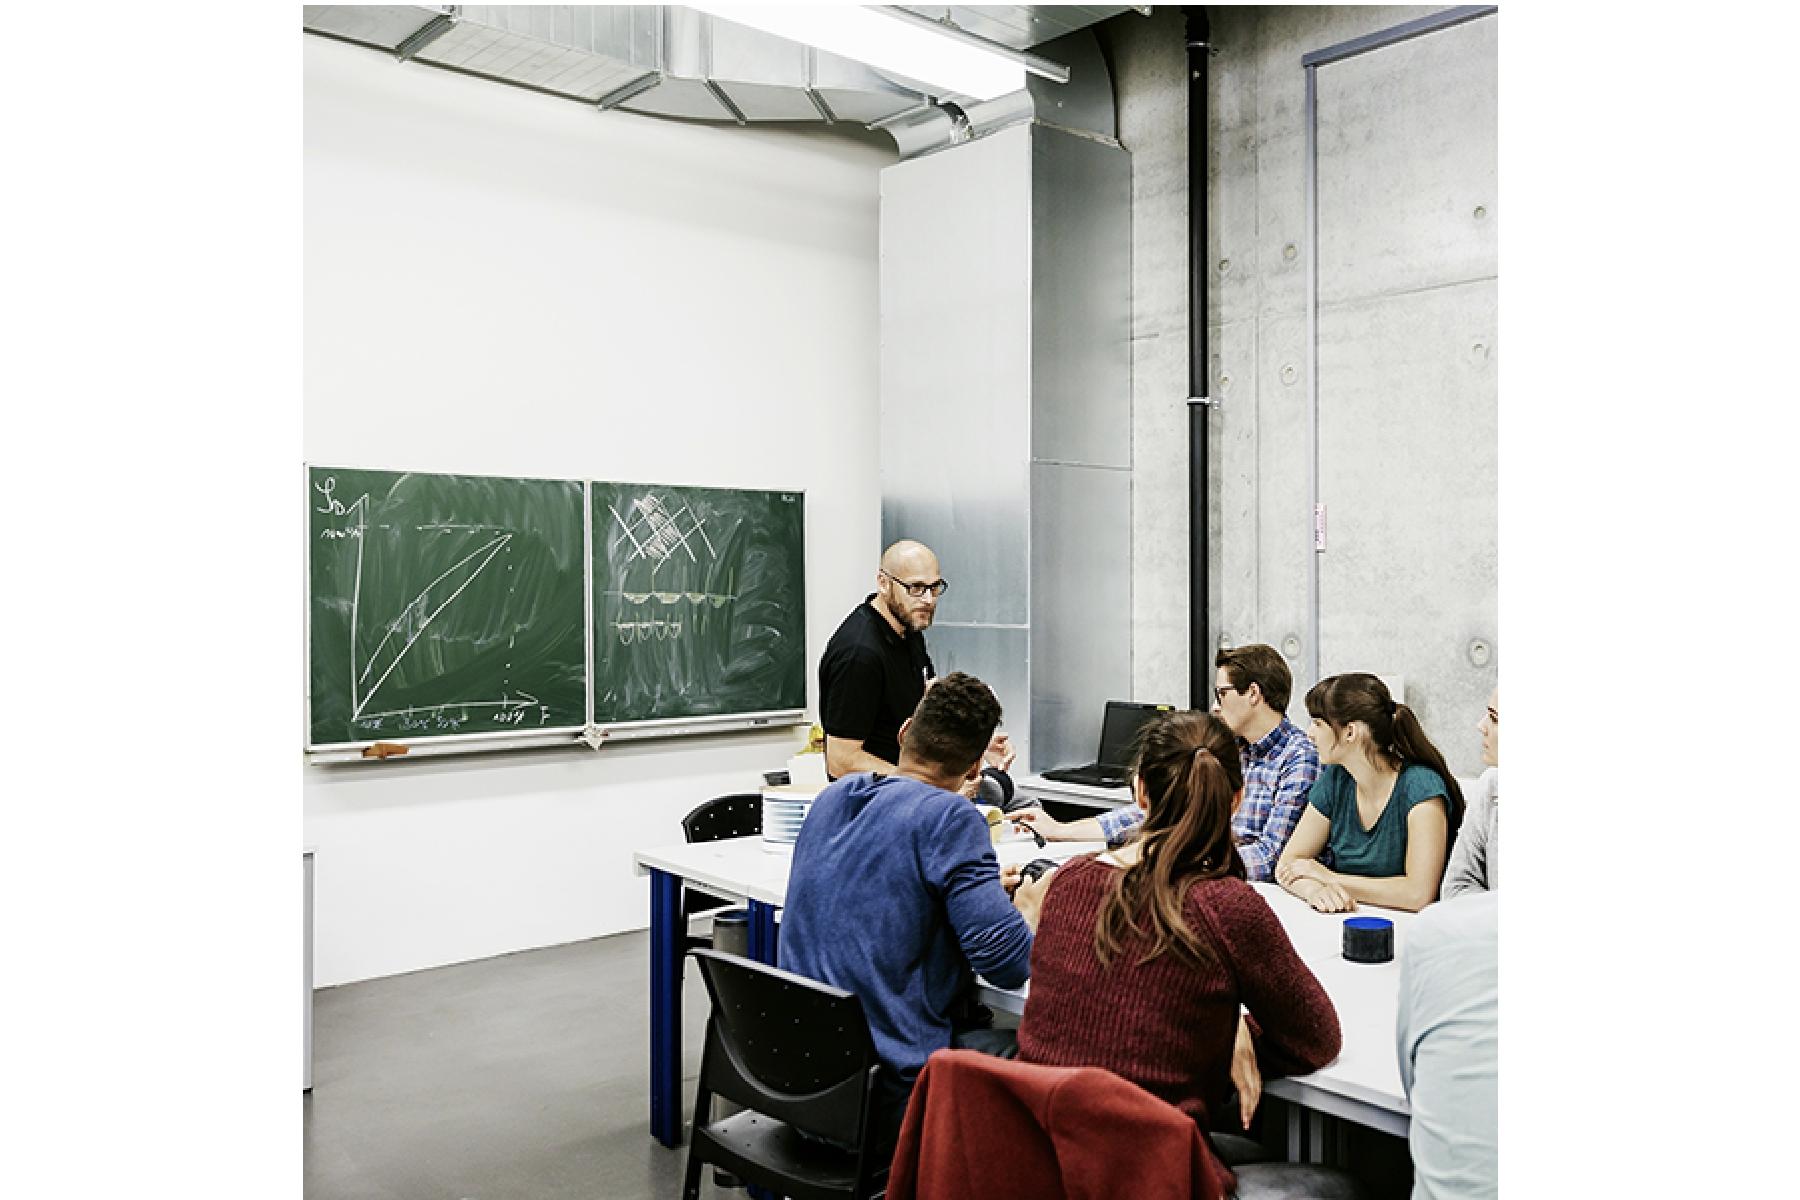 Arm、半導体関連スタートアップ企業を支援する新プログラムを発表